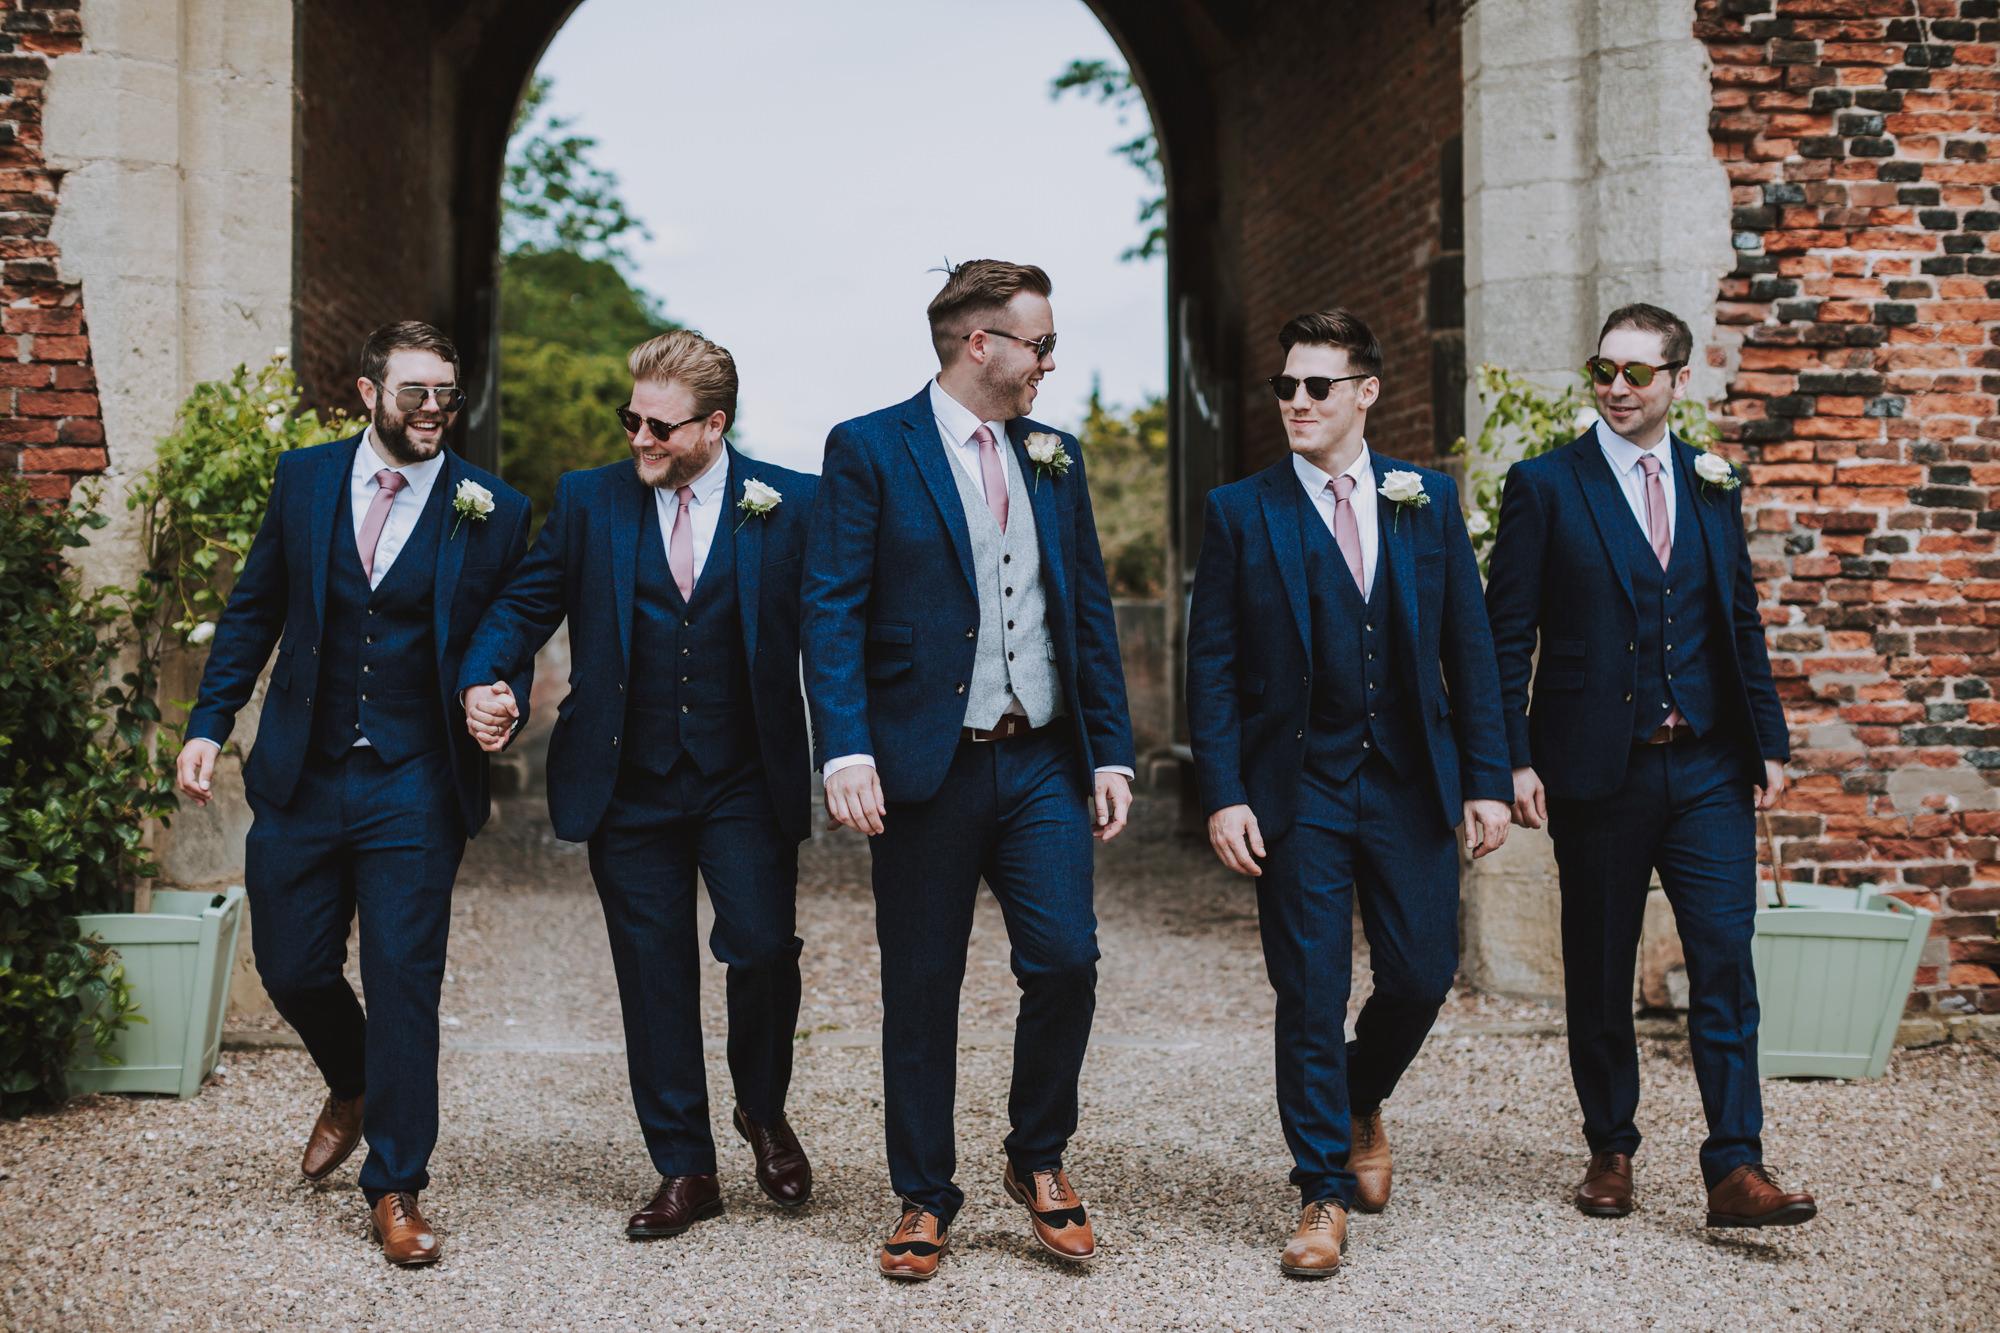 hodsock priory wedding photographers blog17.jpg